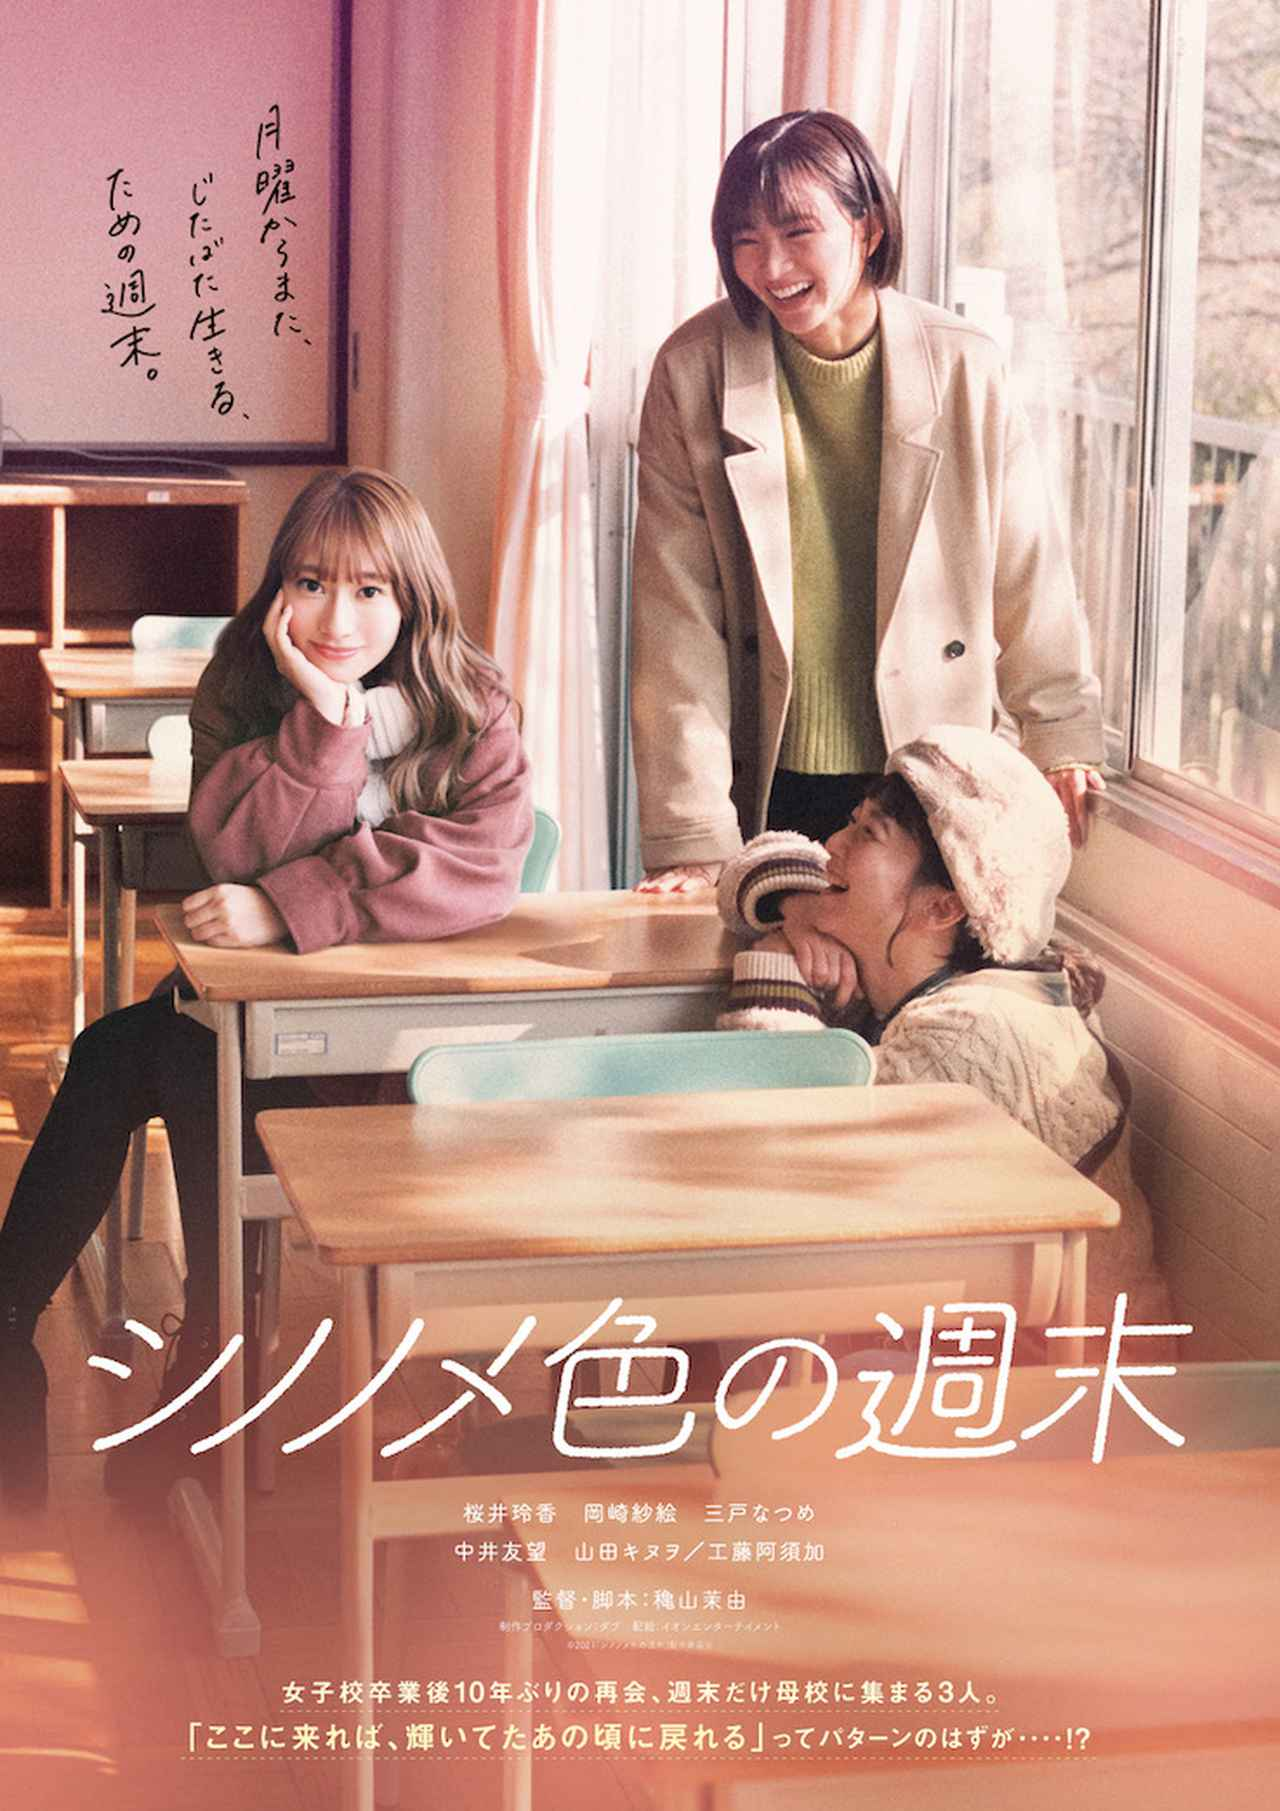 Shinonome Color Weekend film - Mayu Akiyama - poster